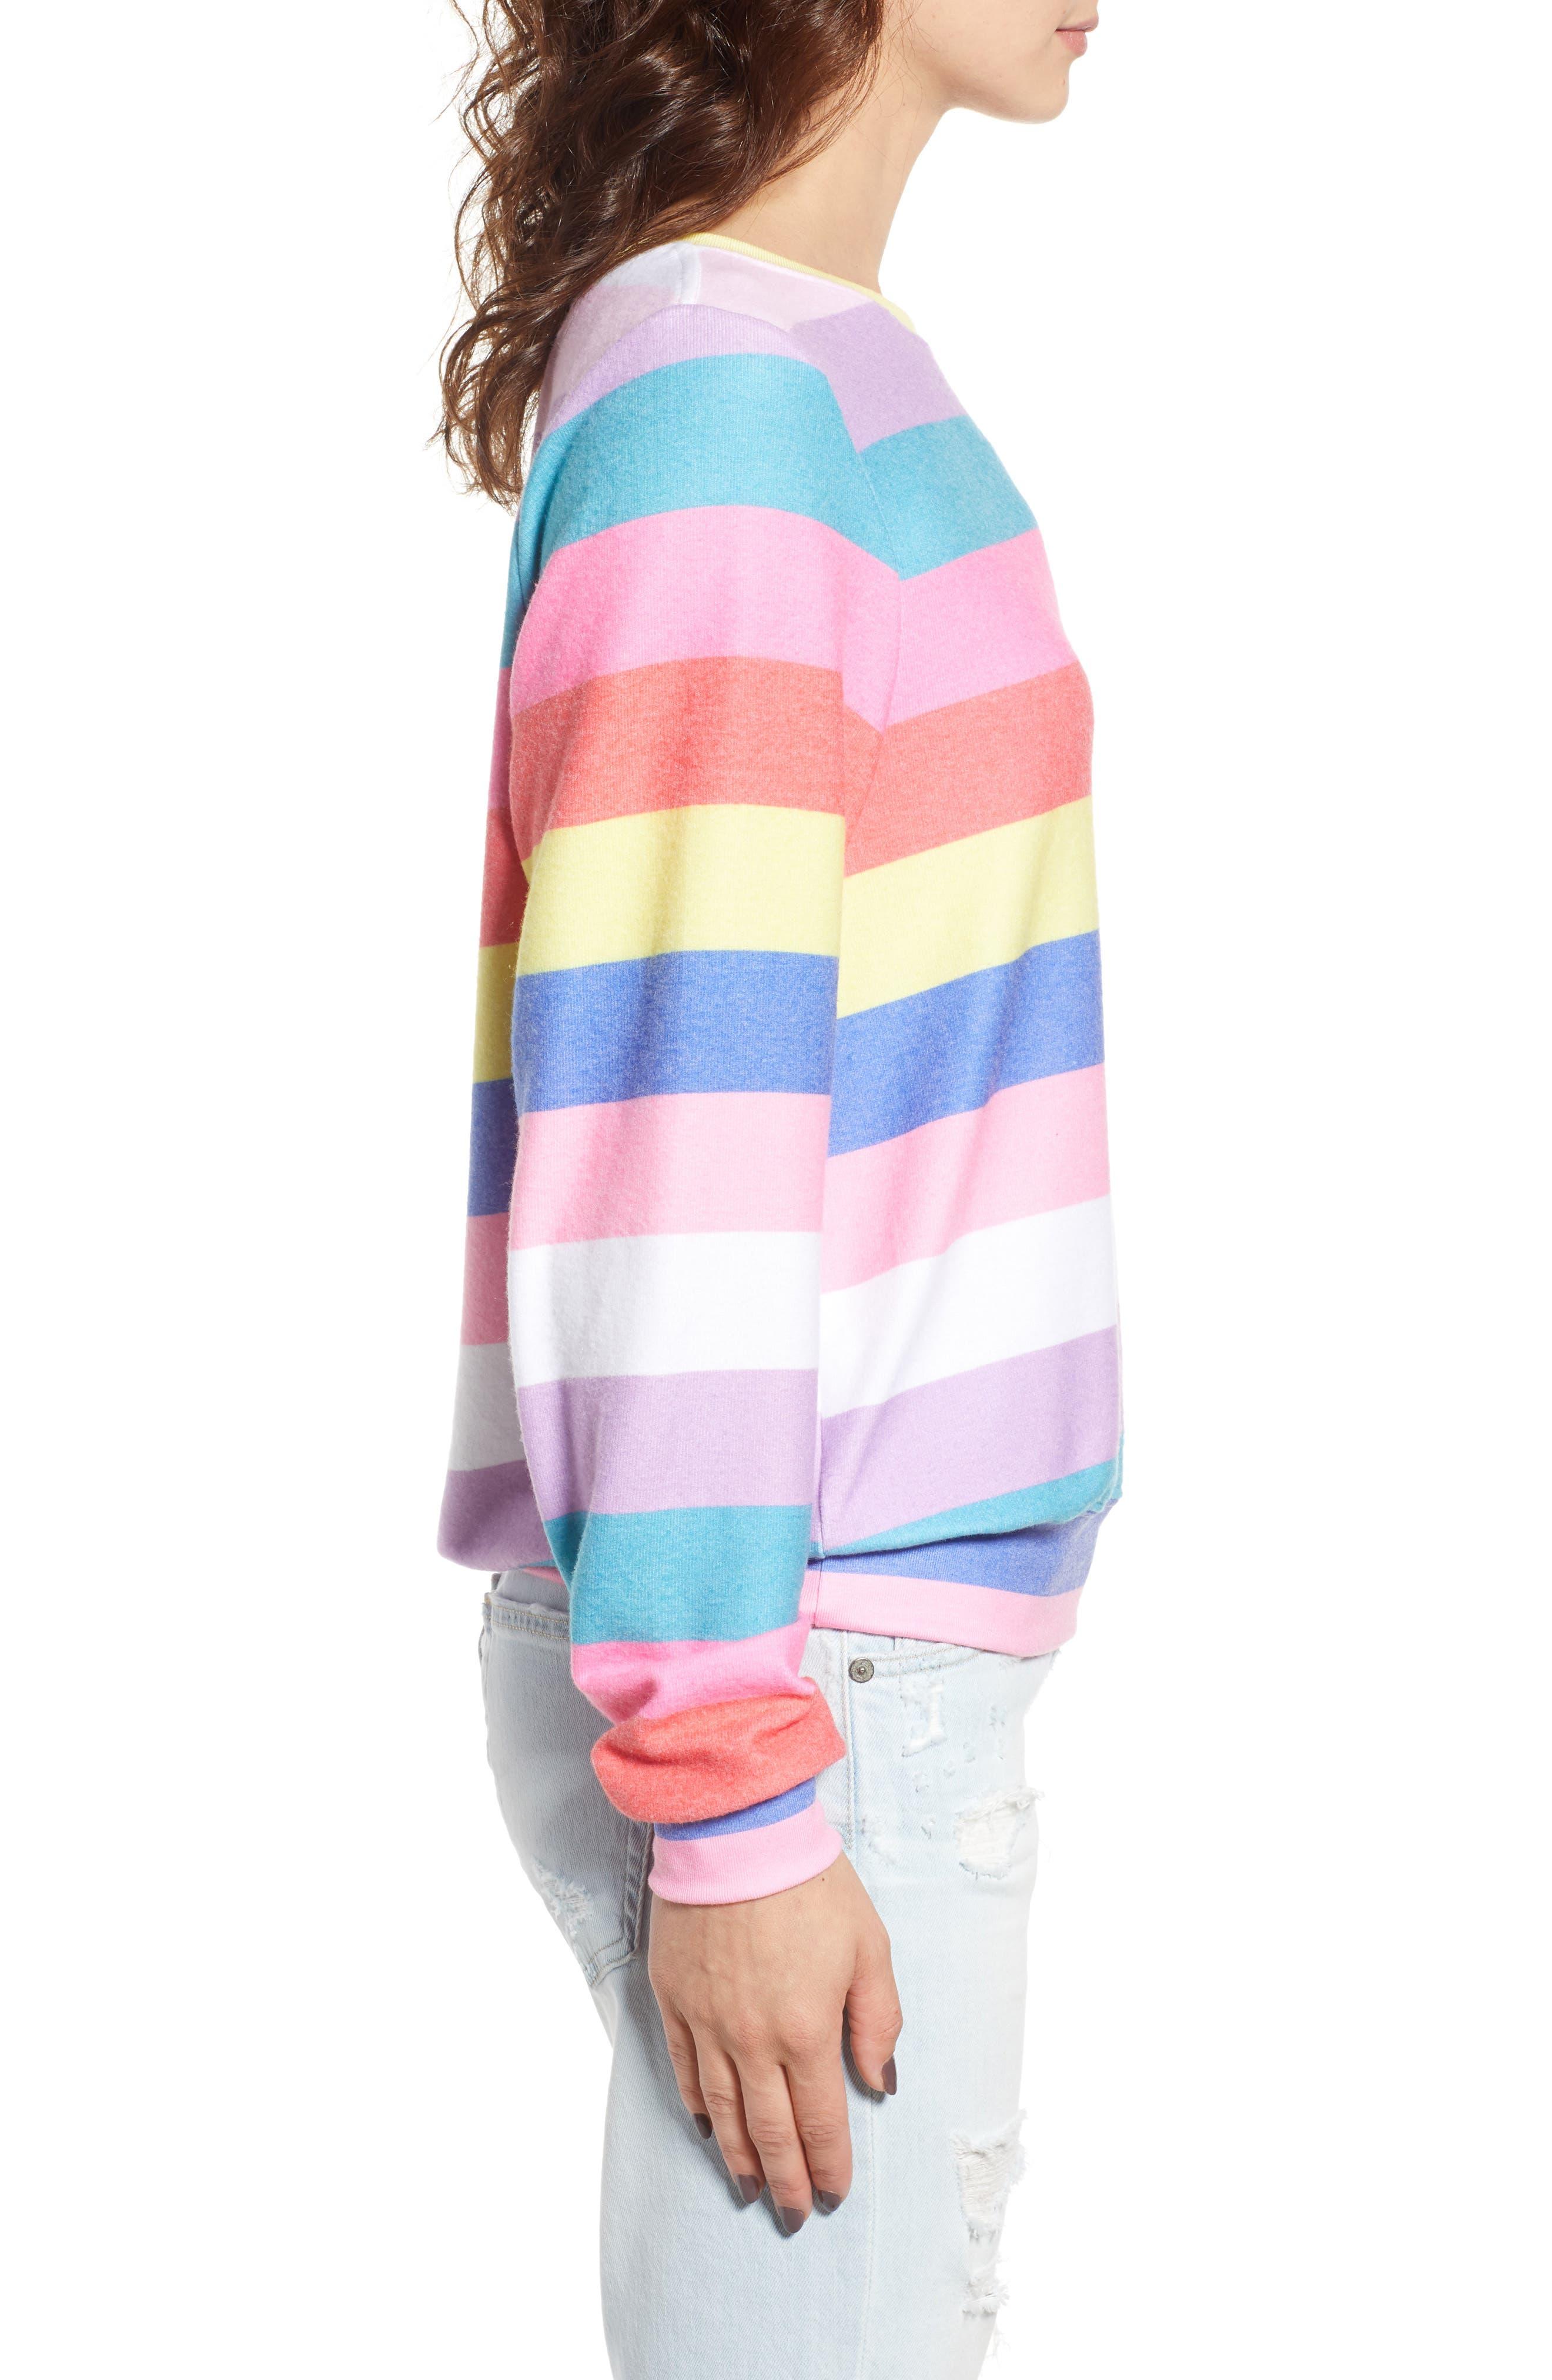 Castaway Roadtrip Sweatshirt,                             Alternate thumbnail 3, color,                             Multi Colored